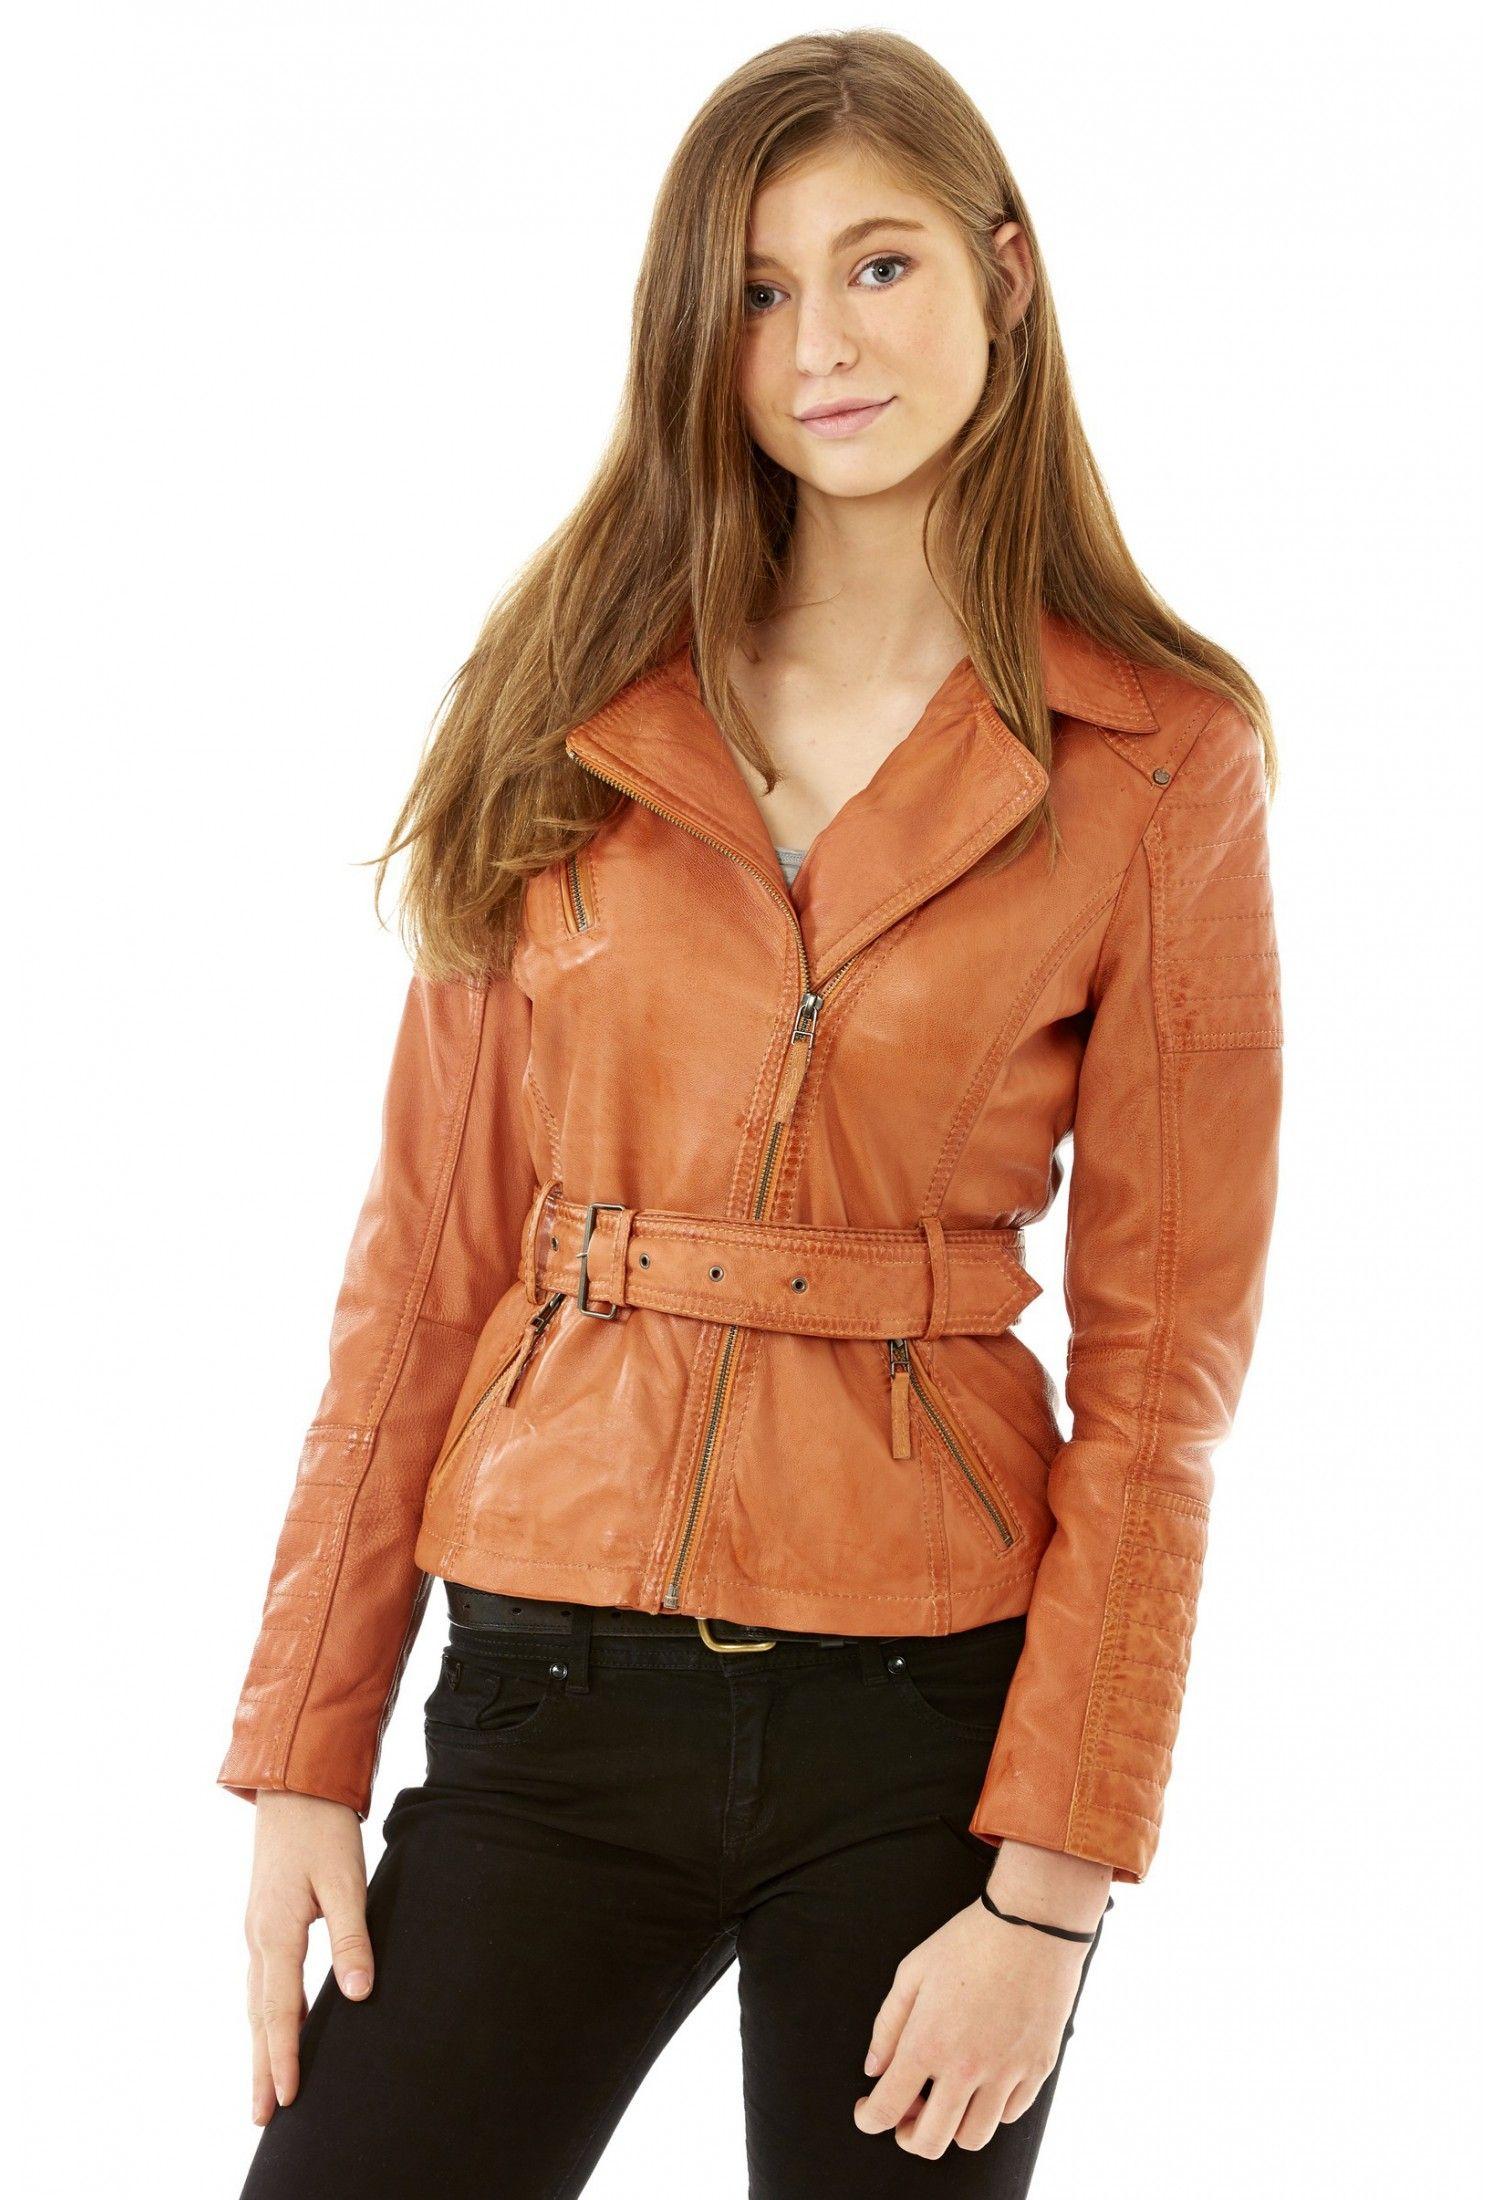 Veste cintree femme orange